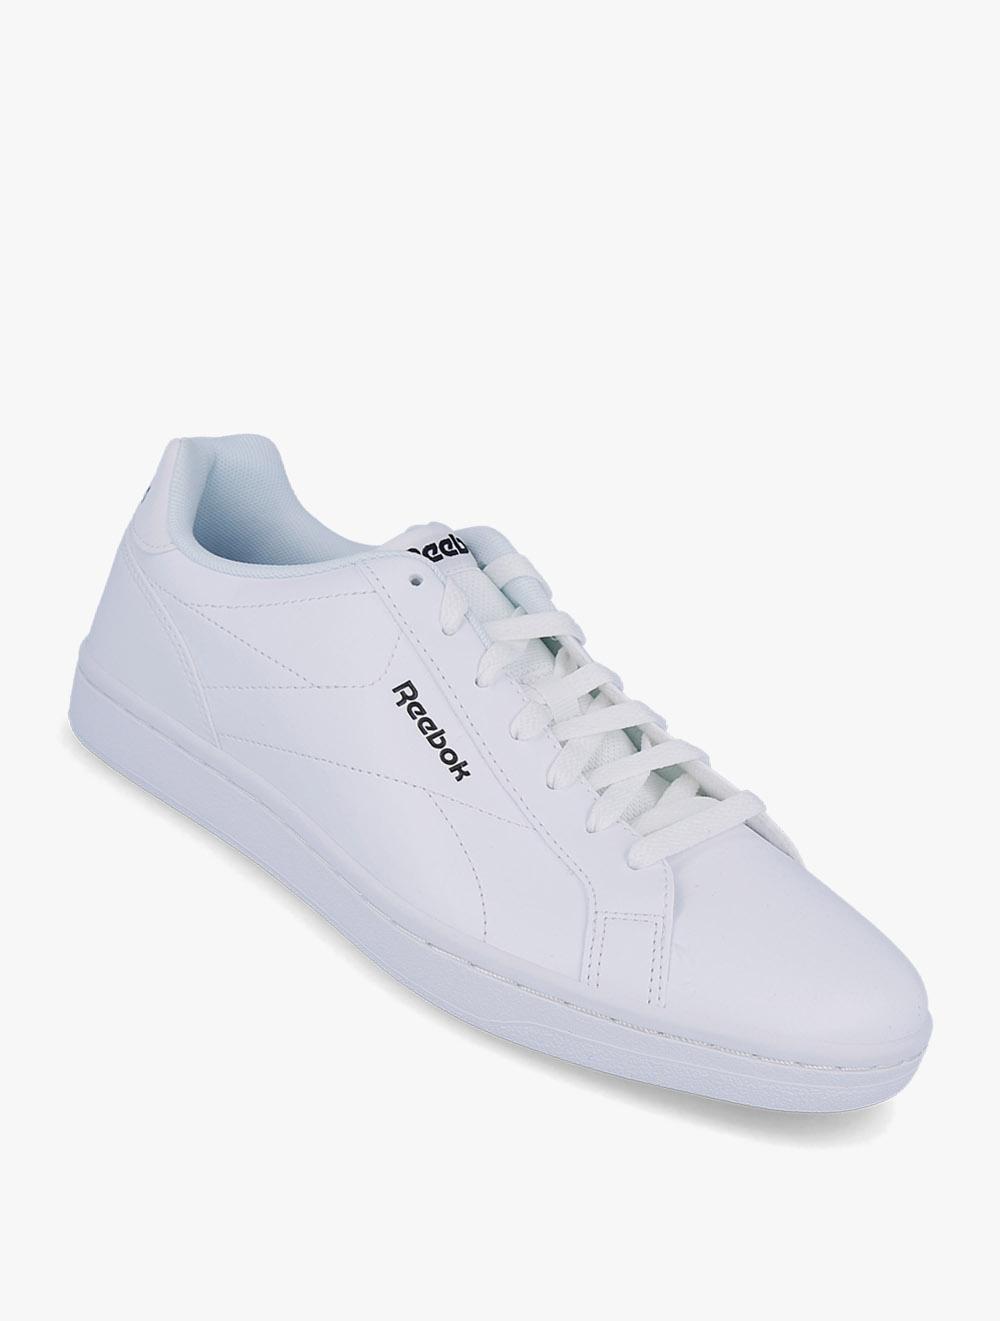 2017 New Arrival Men Reebok Shoes Reebok Royal Complete CLN